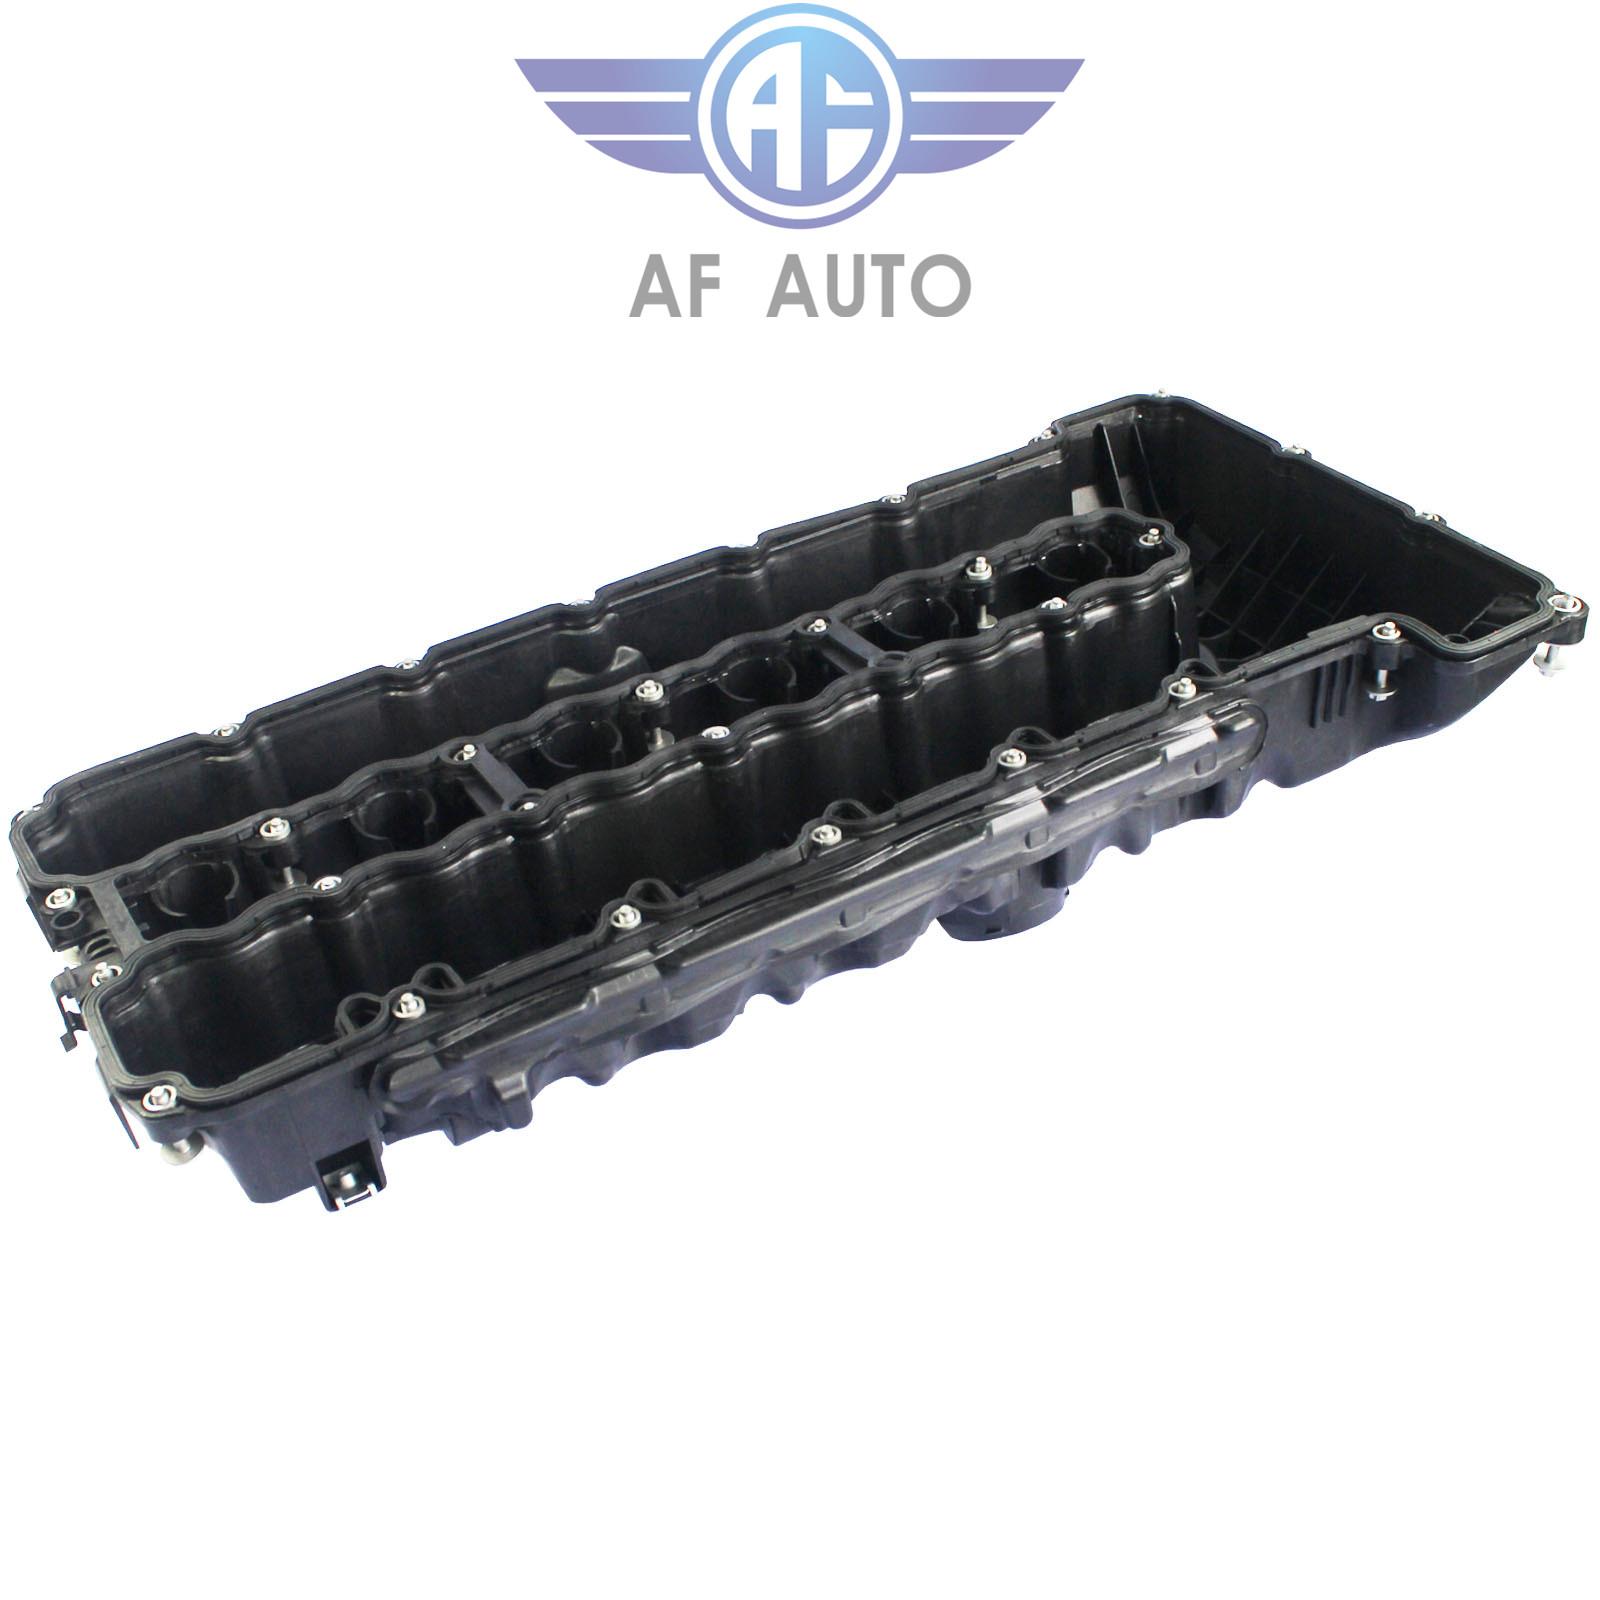 11127565284 For BMW X6 135I 335I 535I Z4 Turbo Valve Cover